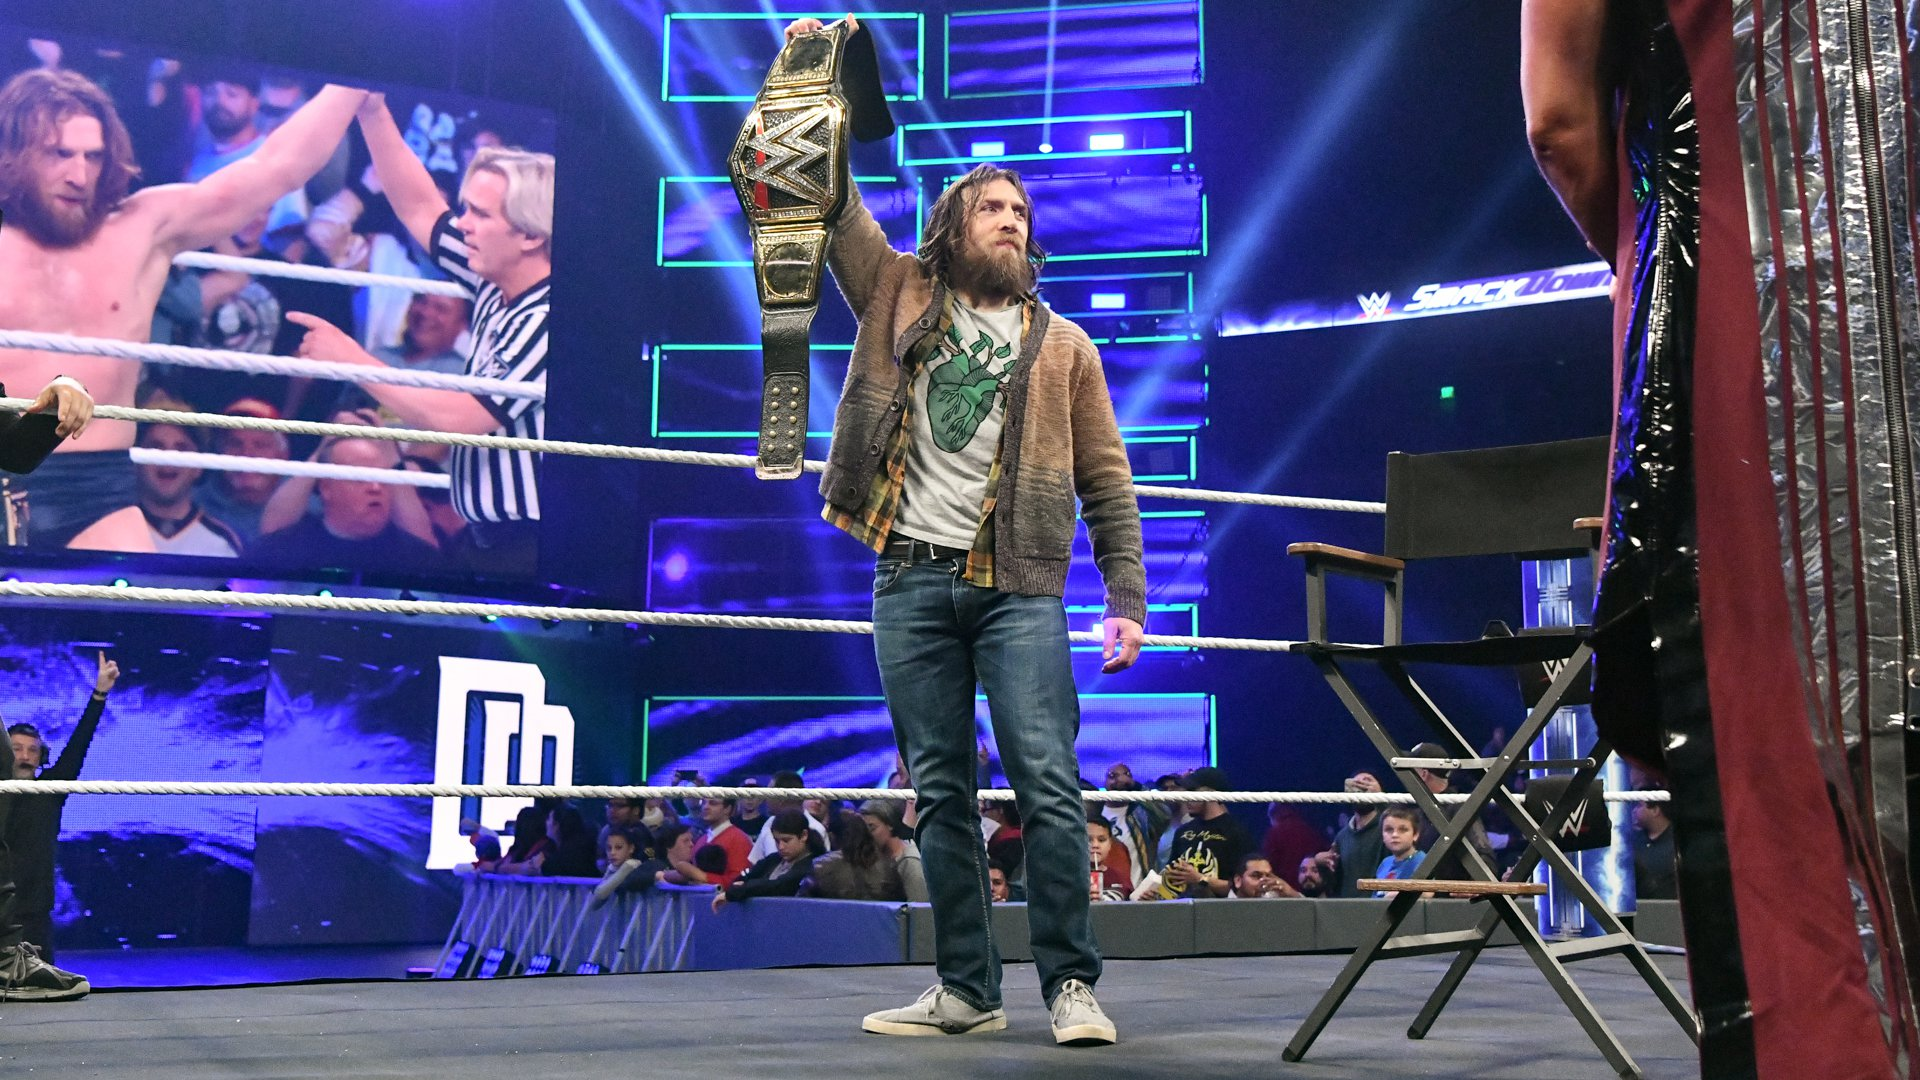 ... WWE Champion Daniel Bryan!